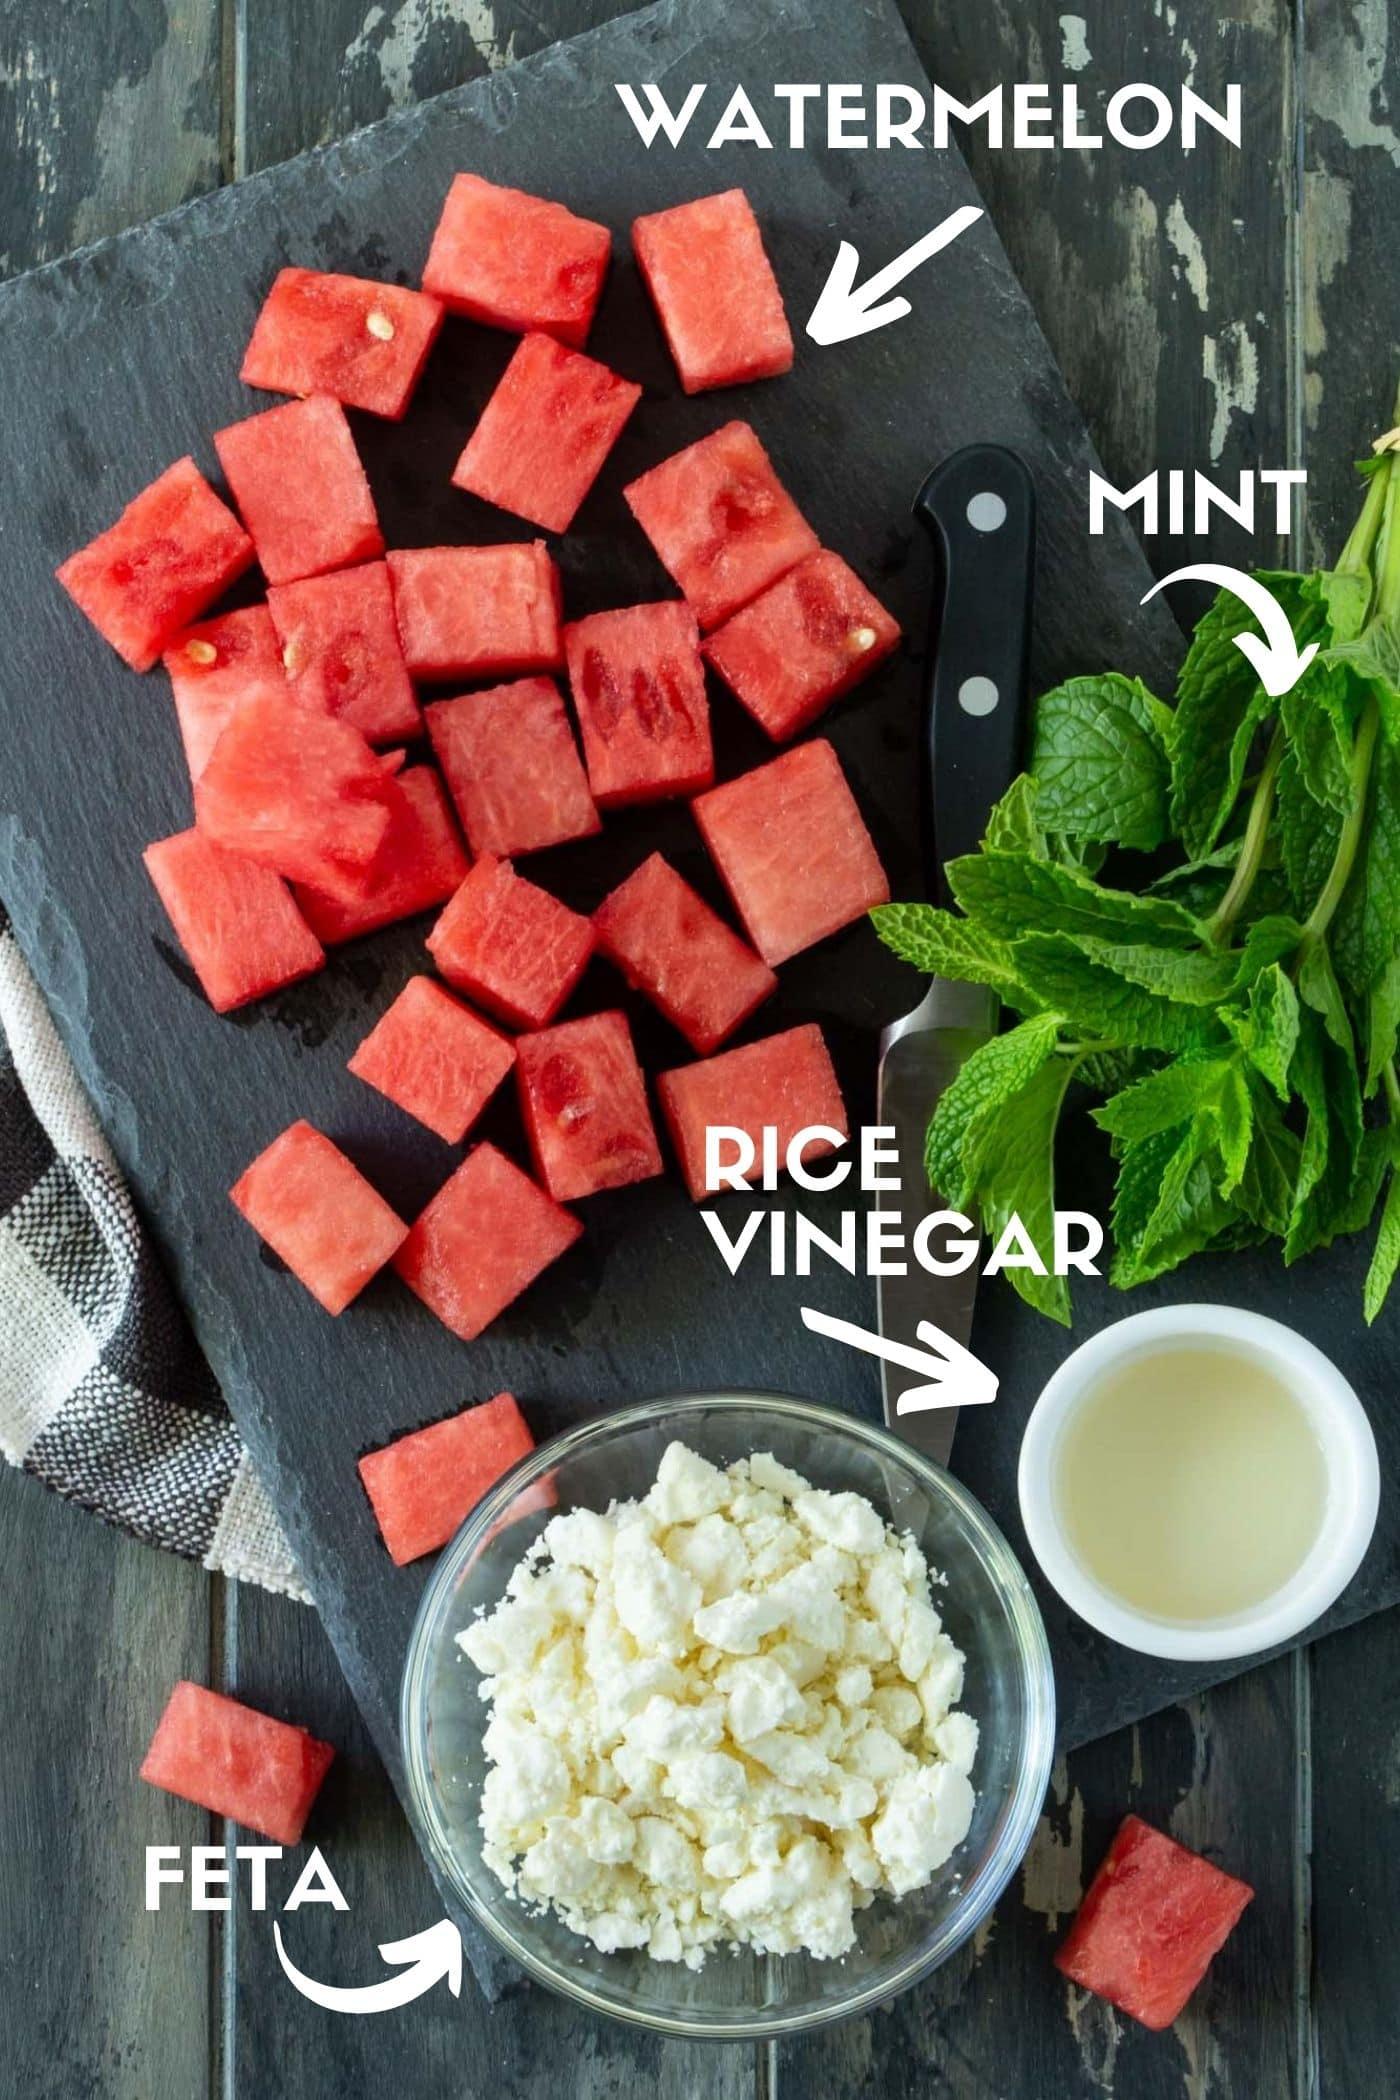 Dark gray cutting board filled with fresh watermelon cubes, salty feta cheese, fresh mint sprigs and rice vinegar.